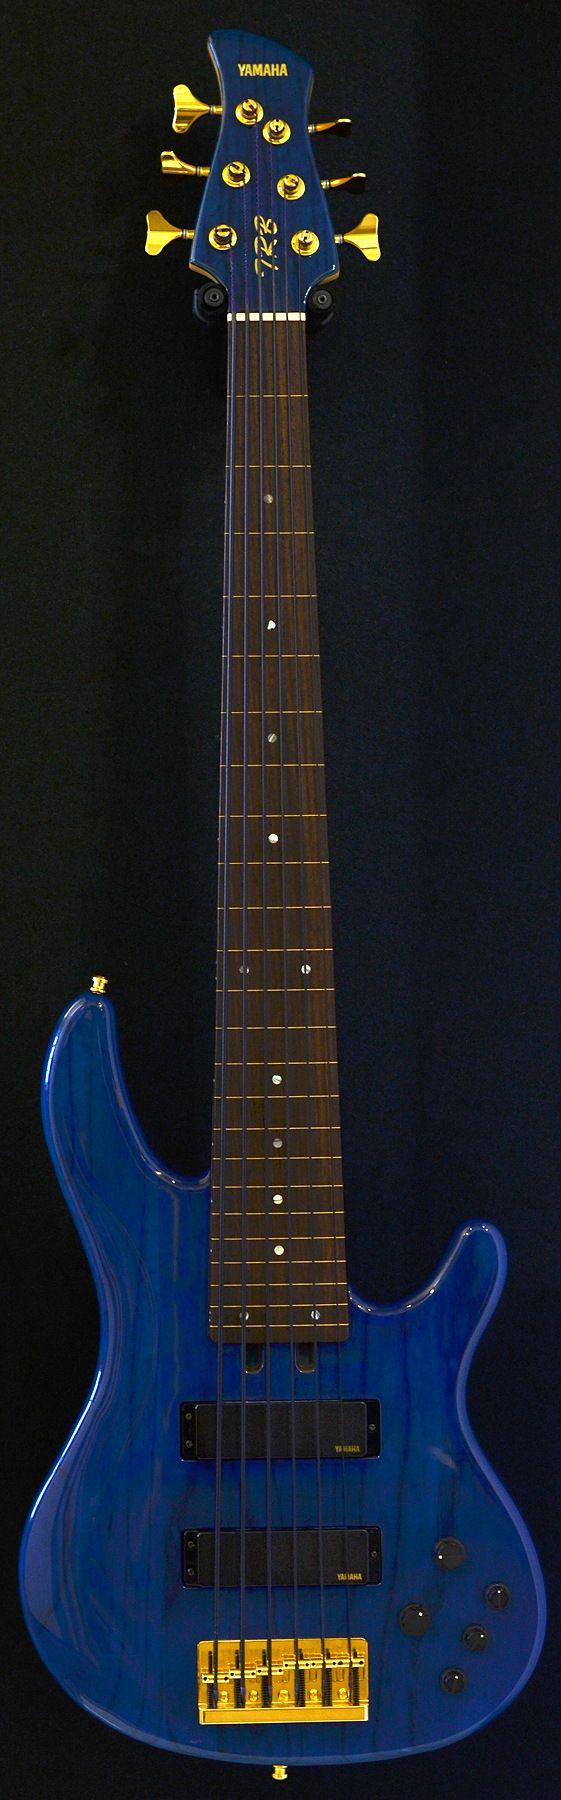 YAMAHA TRB 6 Fretless (via Bass Direct) | Guitars & Amplifiers ...